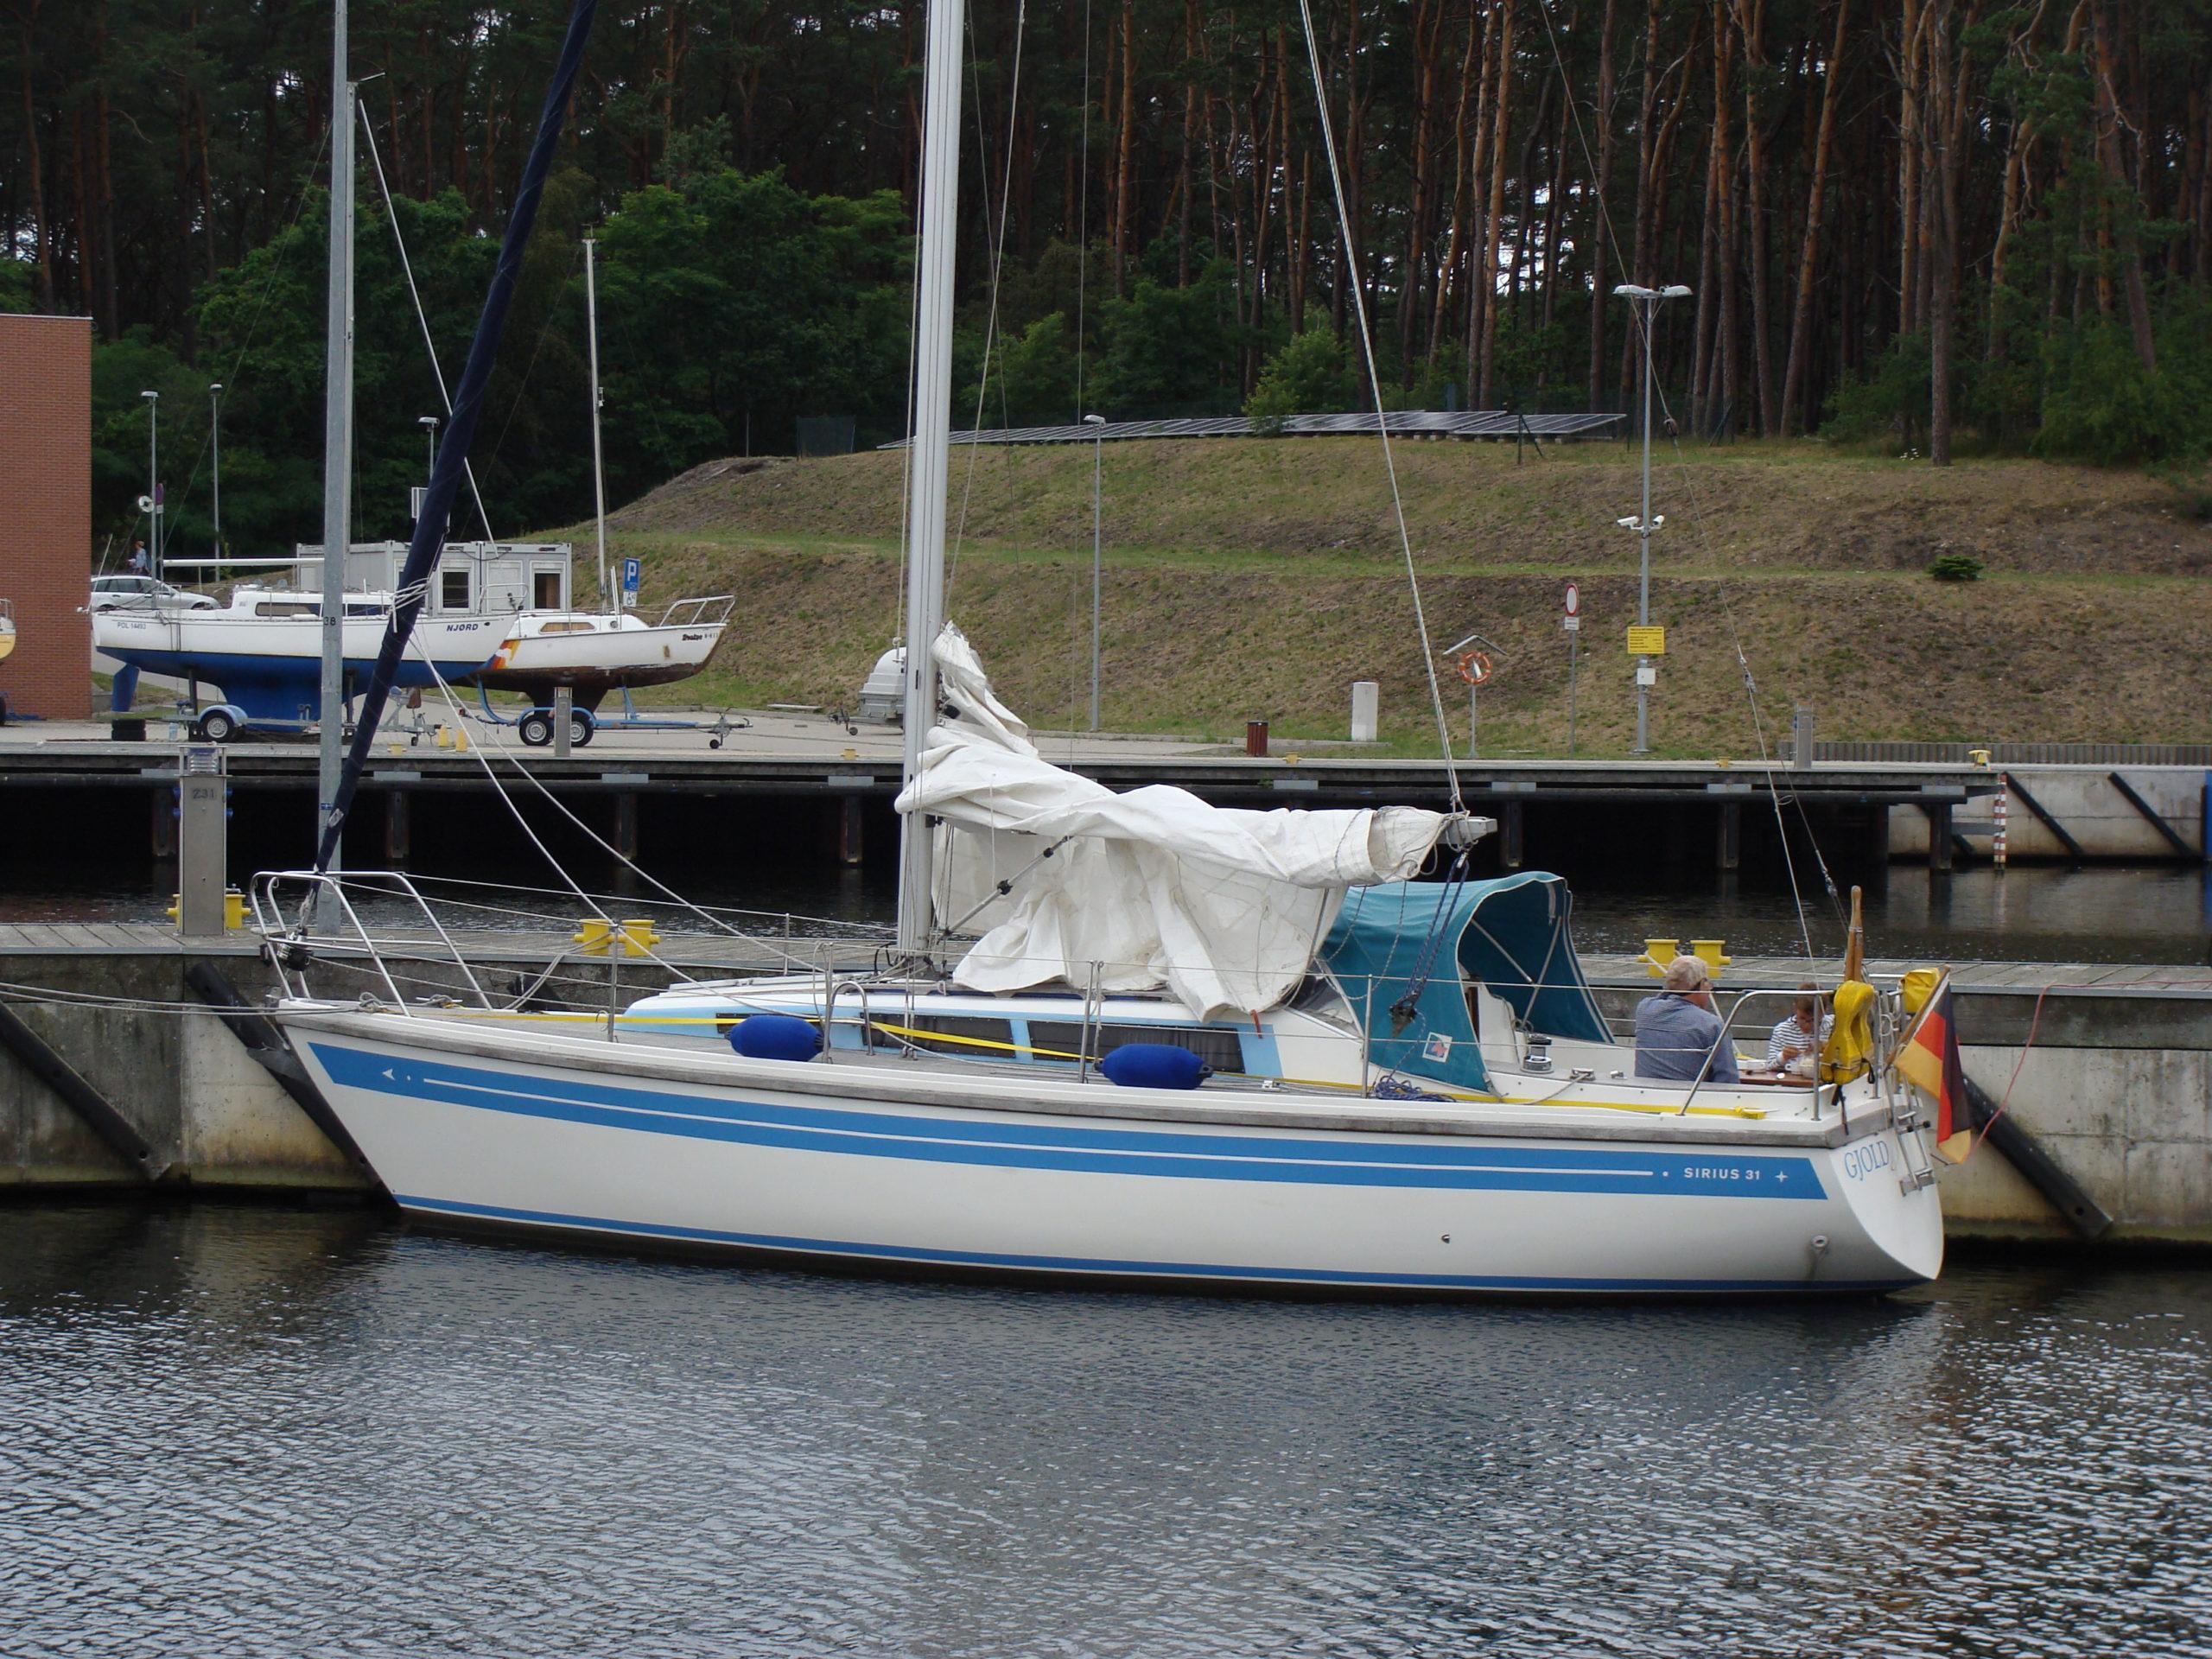 Jacht morski 16